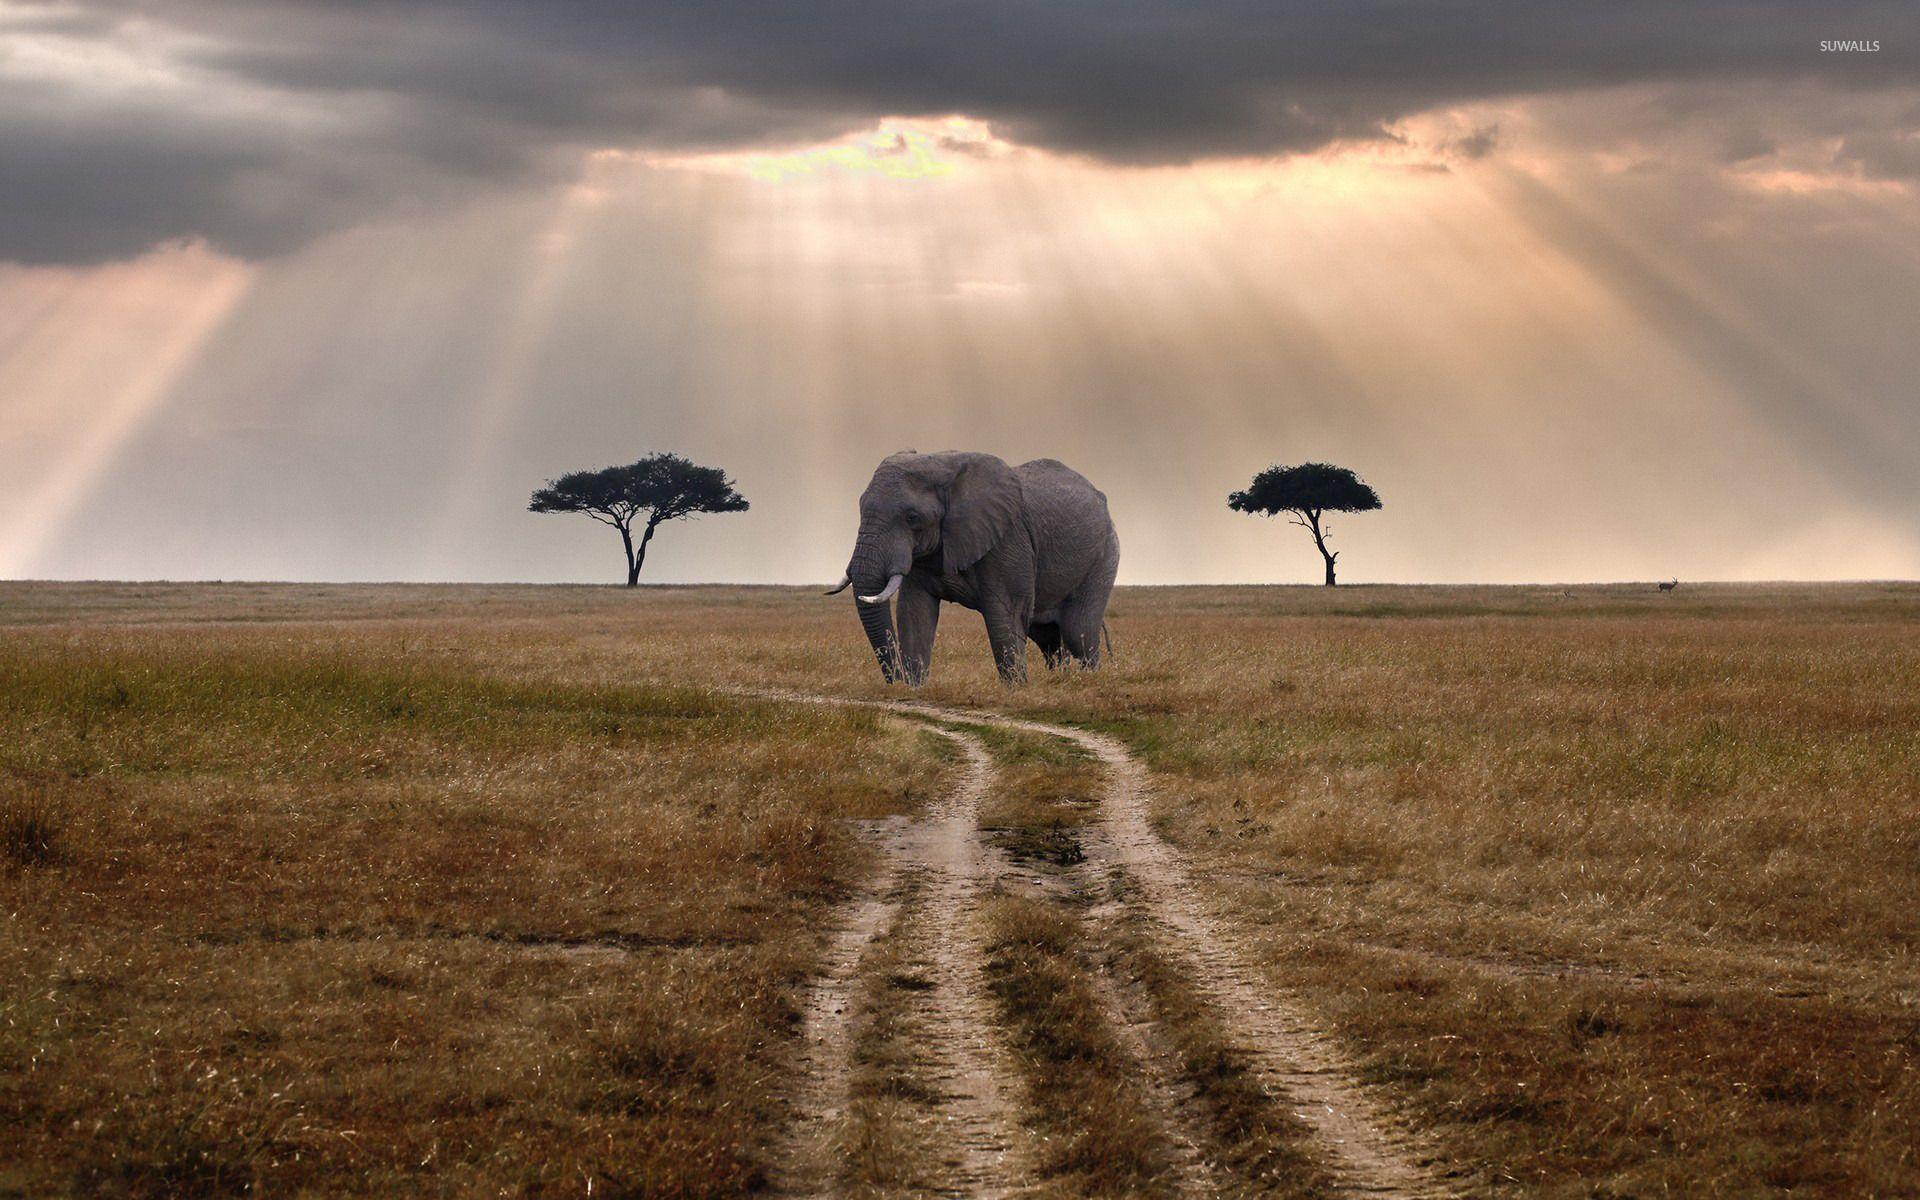 Hd wallpaper elephant - Elephant Wallpapers Wallpaper